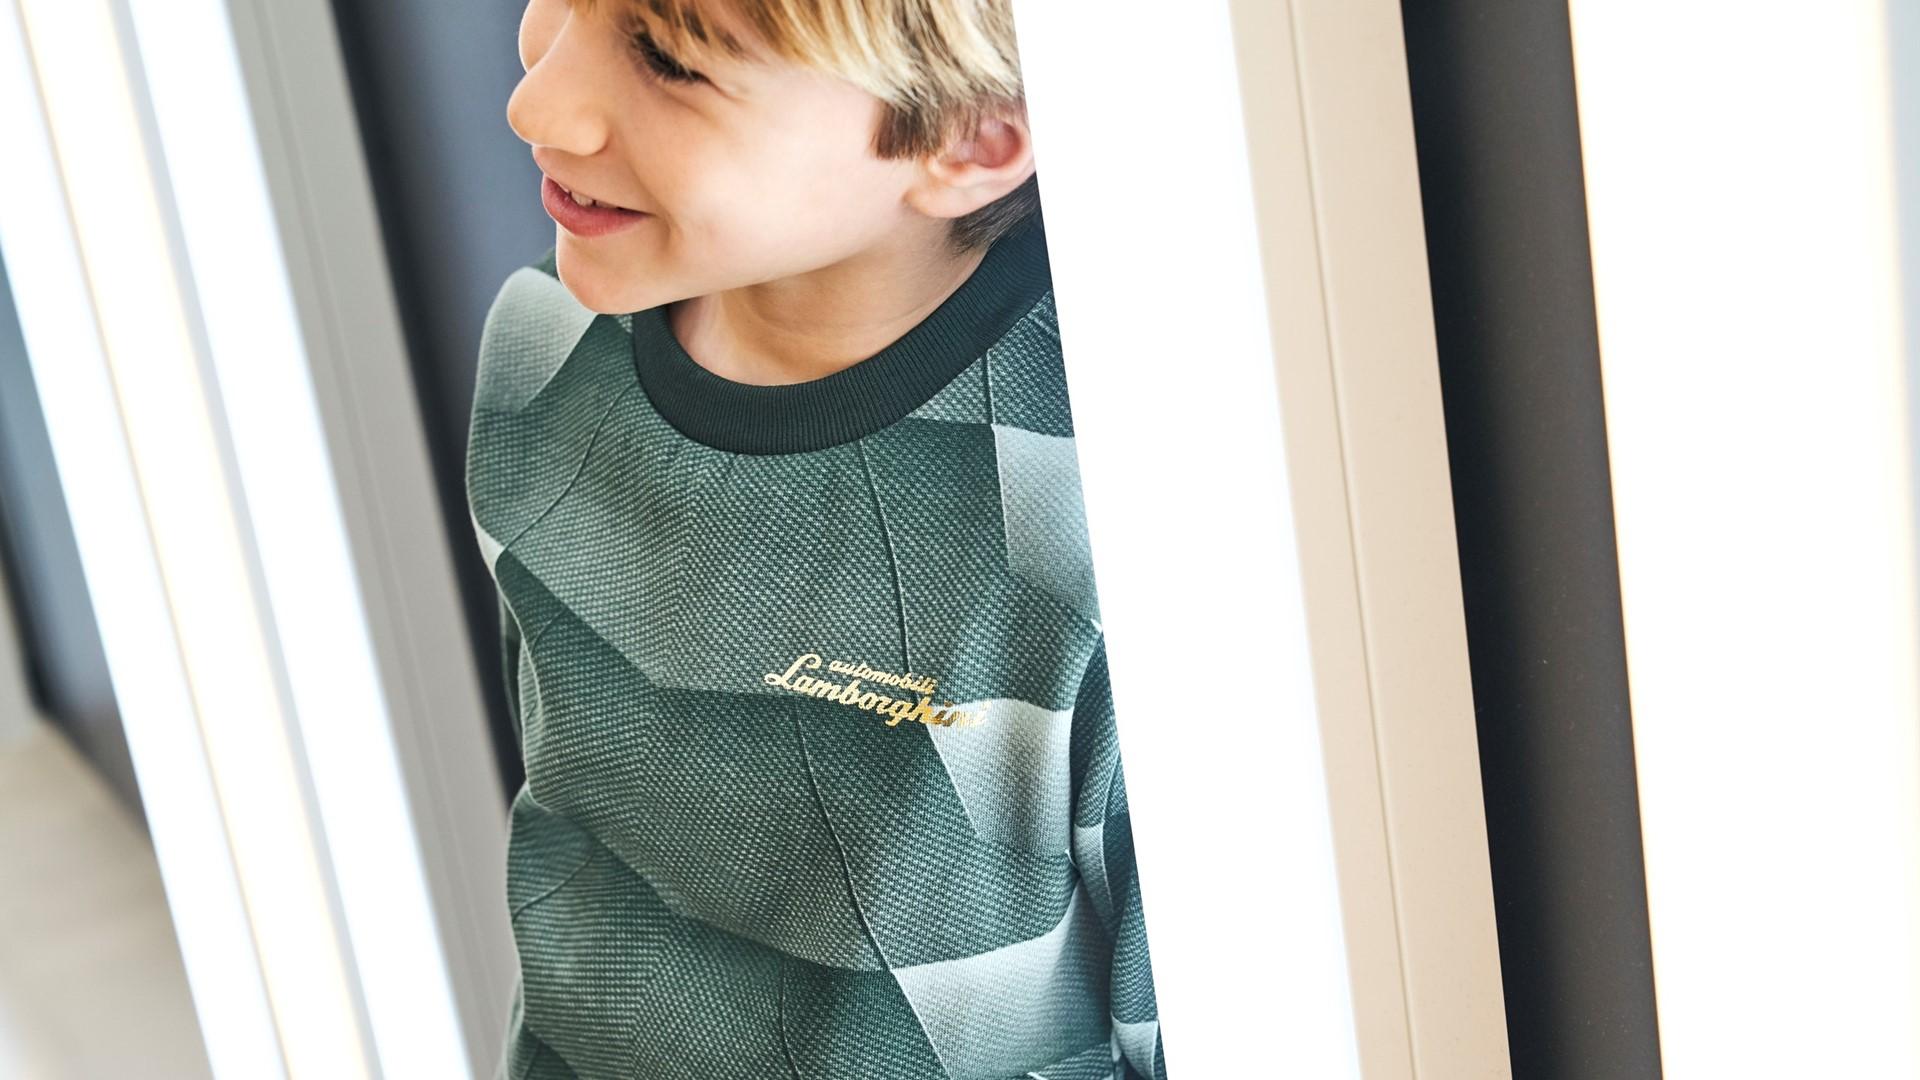 Automobili Lamborghini and KABOOKI confirm kidswear licensing agreement - Image 2